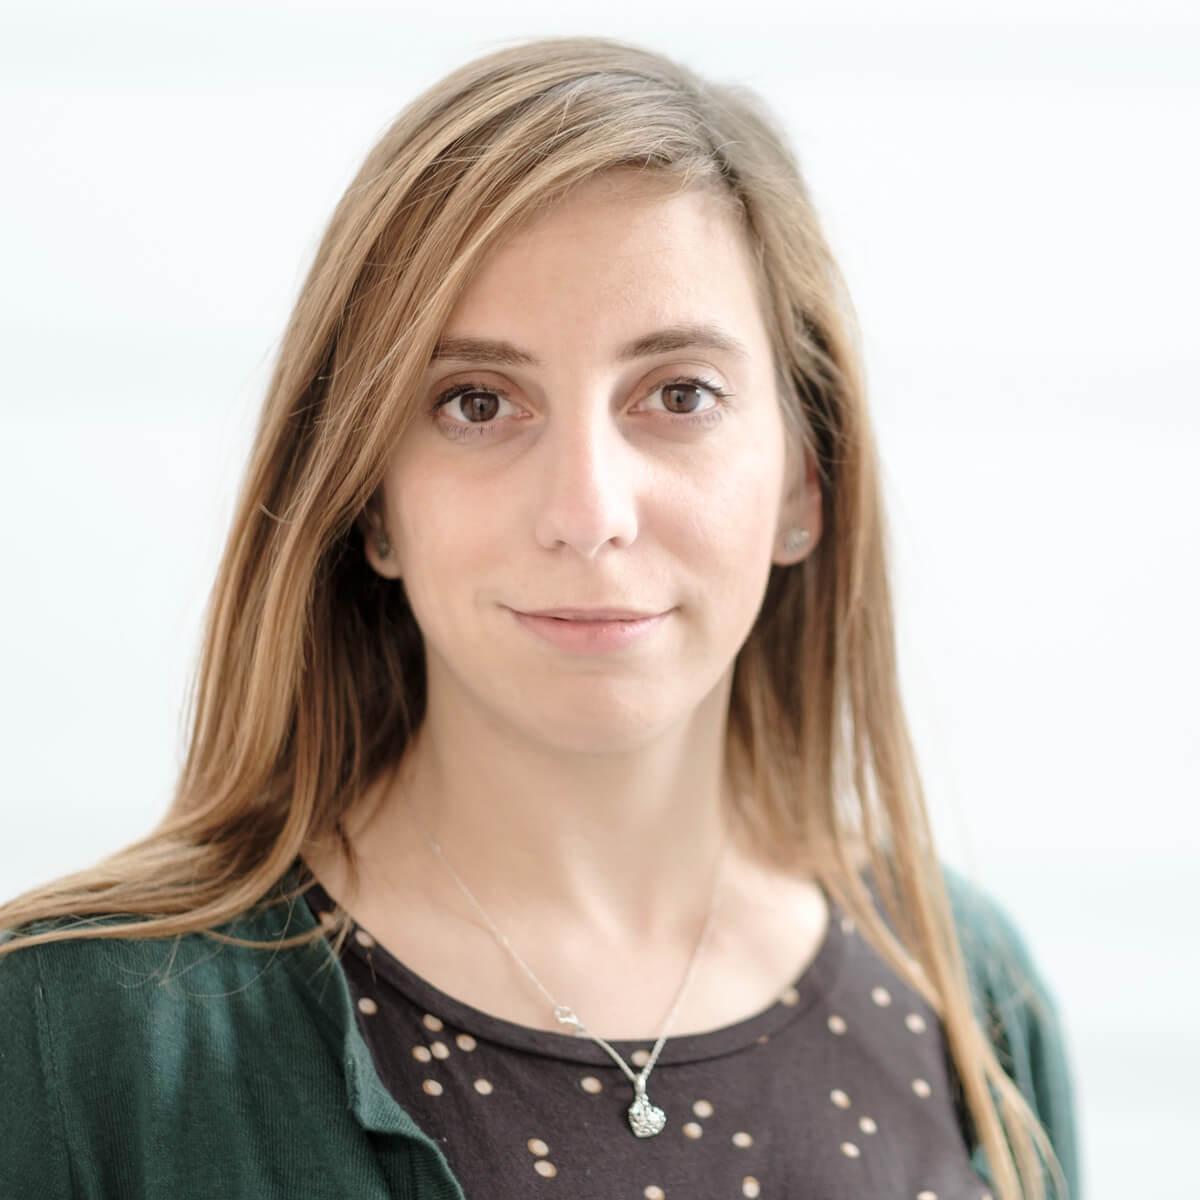 Rechtsanwaltsanwärterin Meier Alice